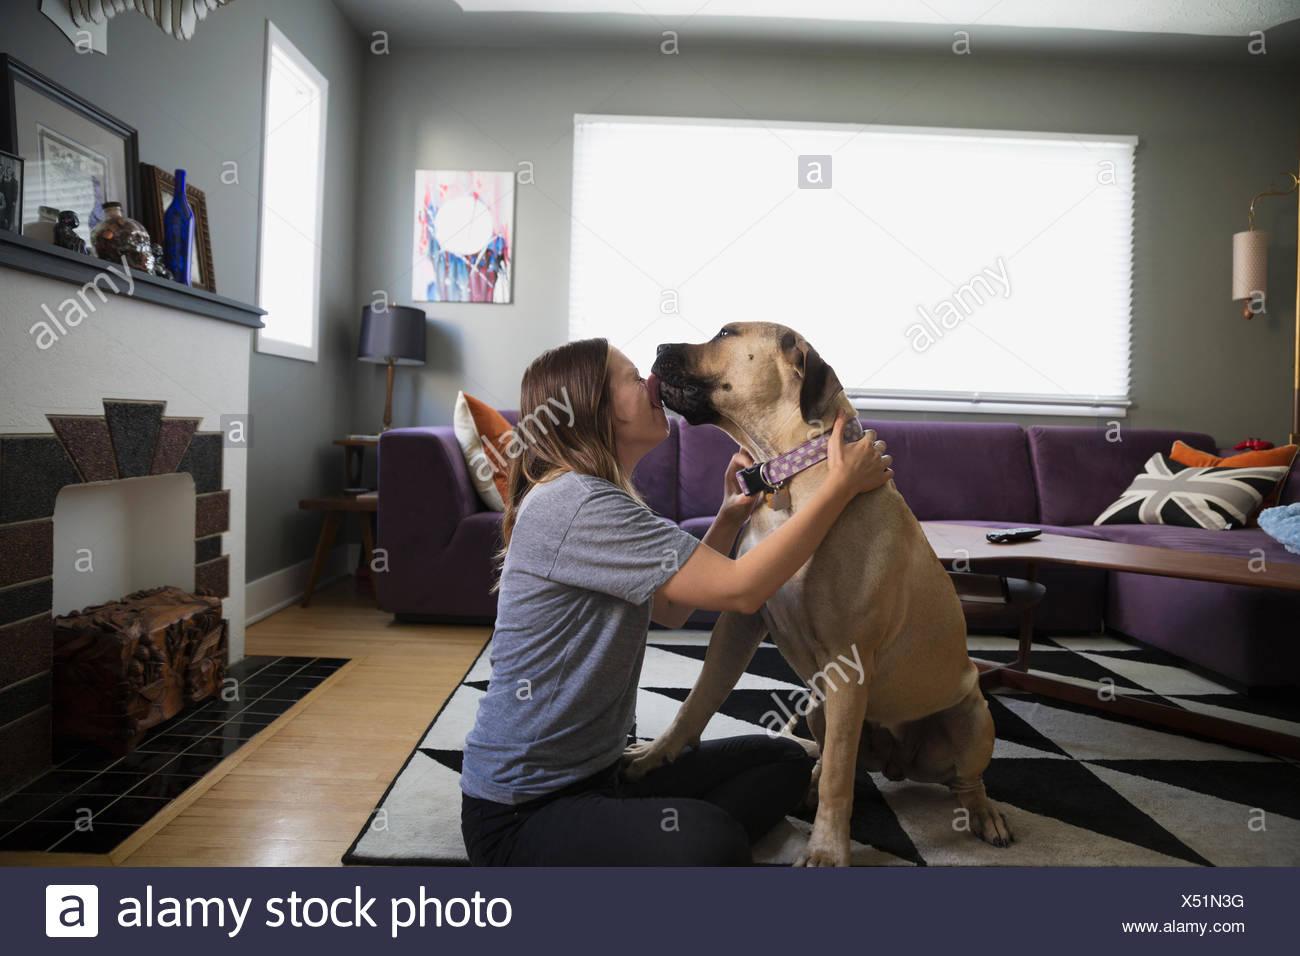 Dog kissing woman on living room floor - Stock Image